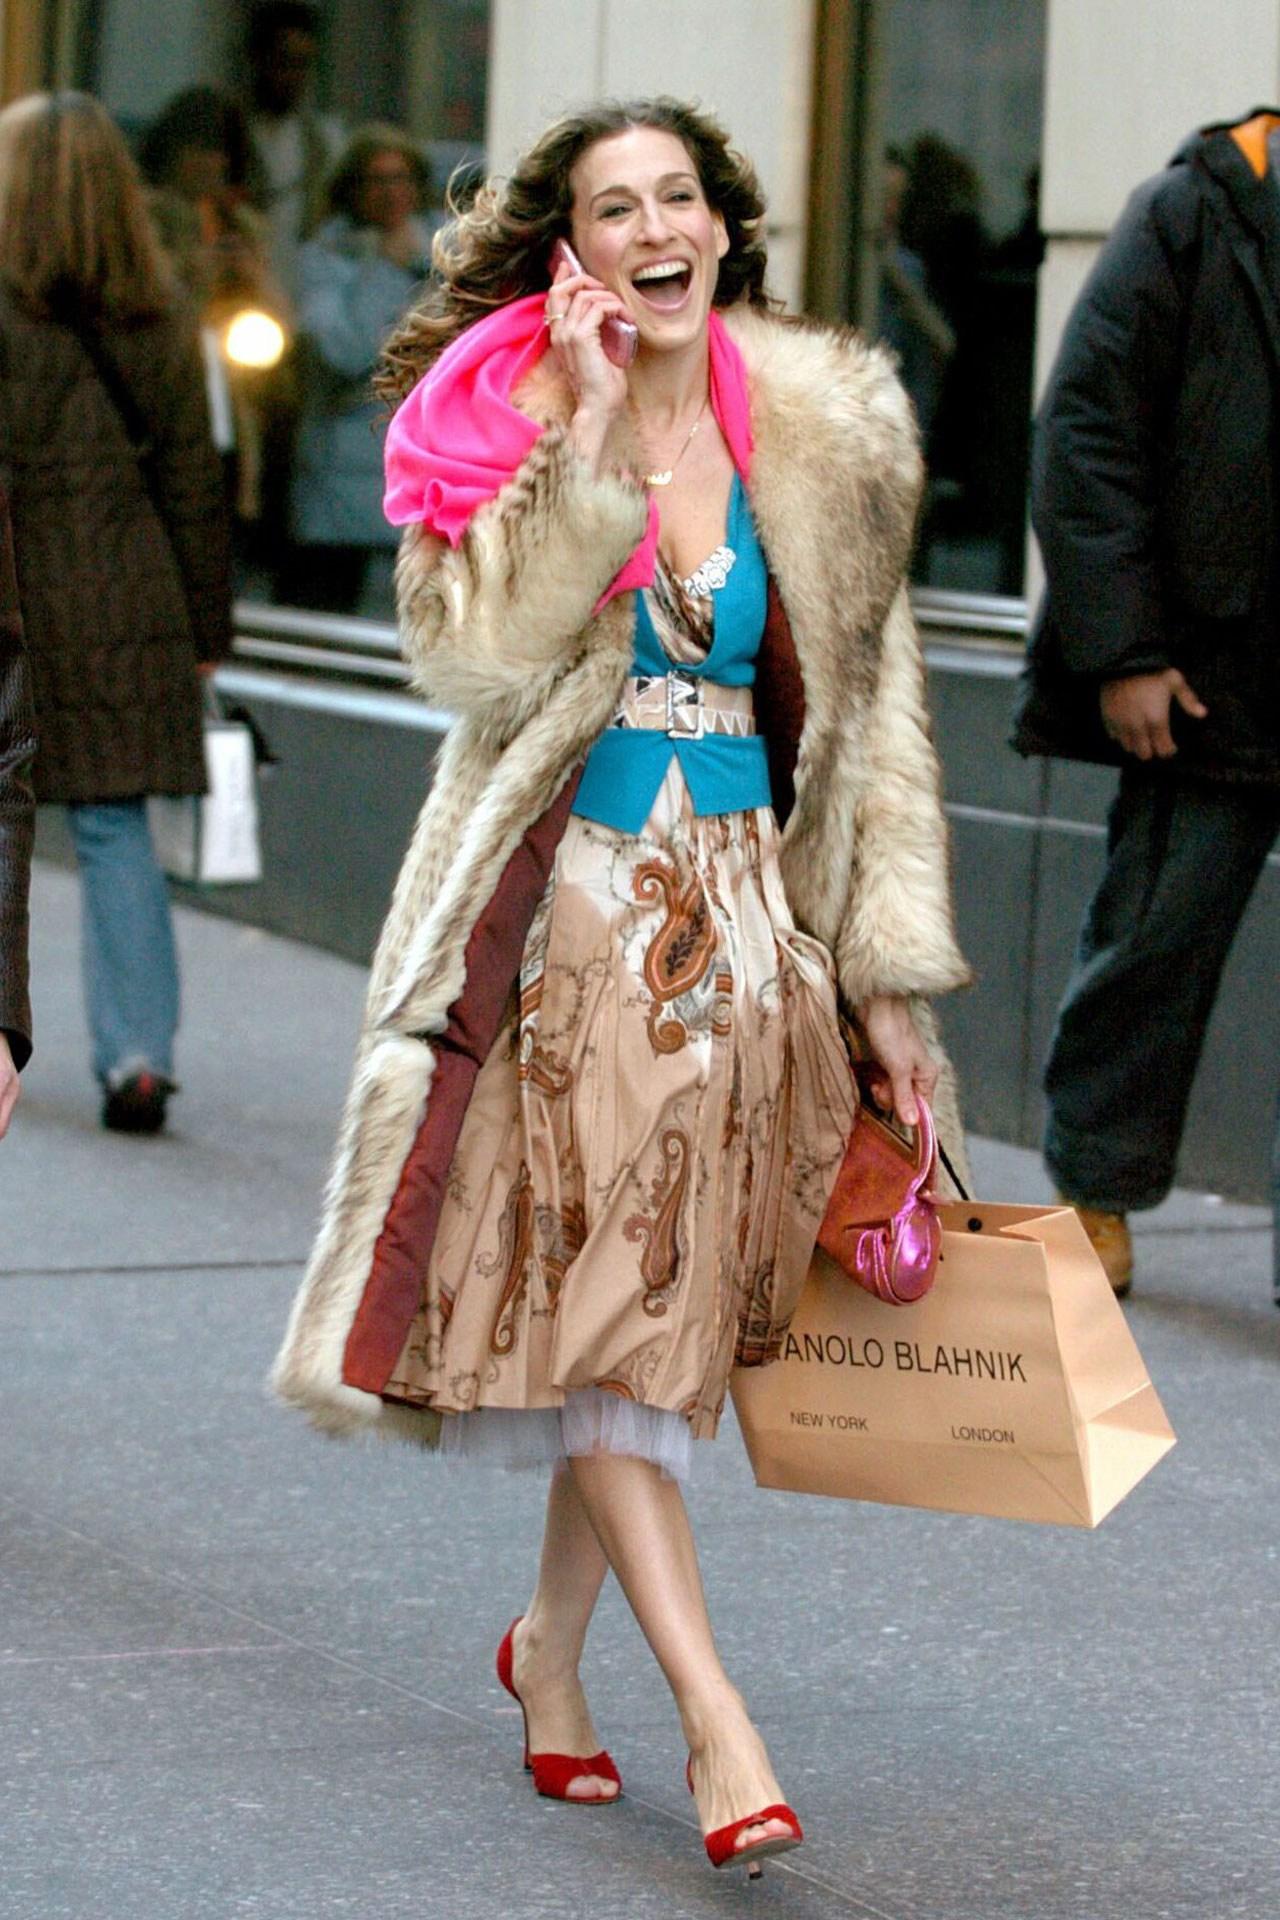 Sarah-Jessica-Parker-Sex-and-the-city-Vogue-12jun13-Rex_b